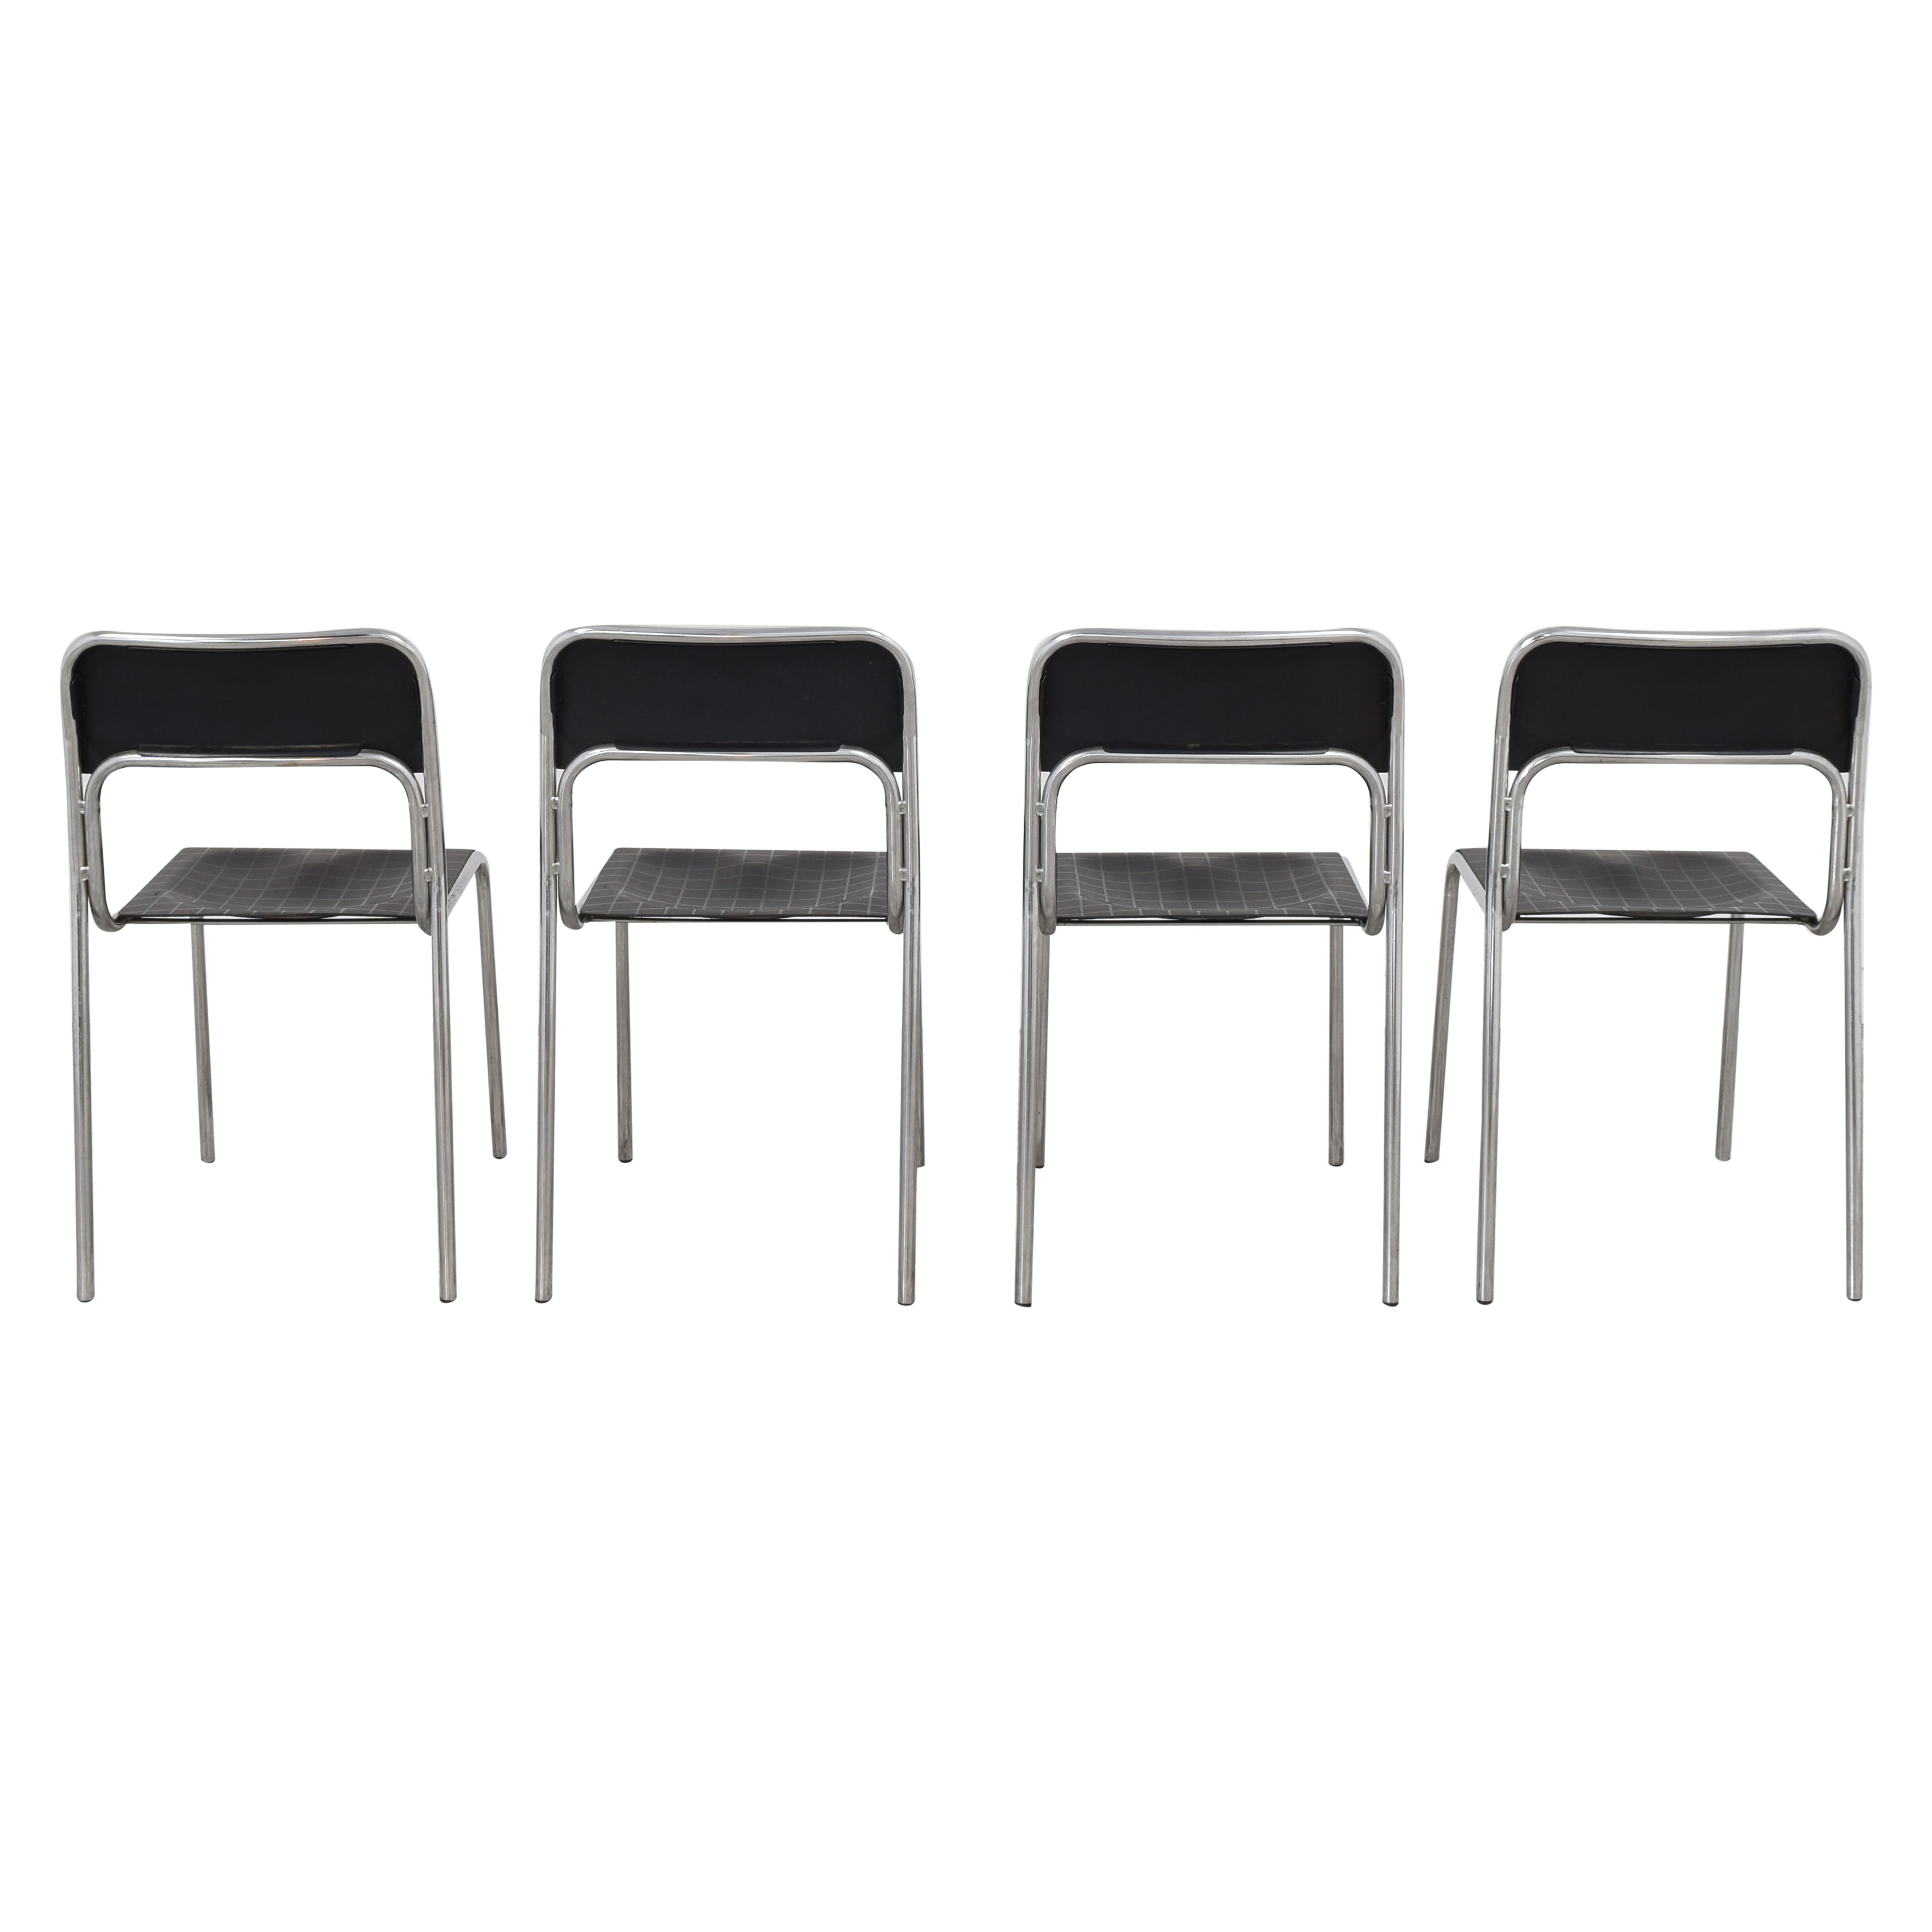 buy Sintesi Sintesi Italian Dining Chairs online